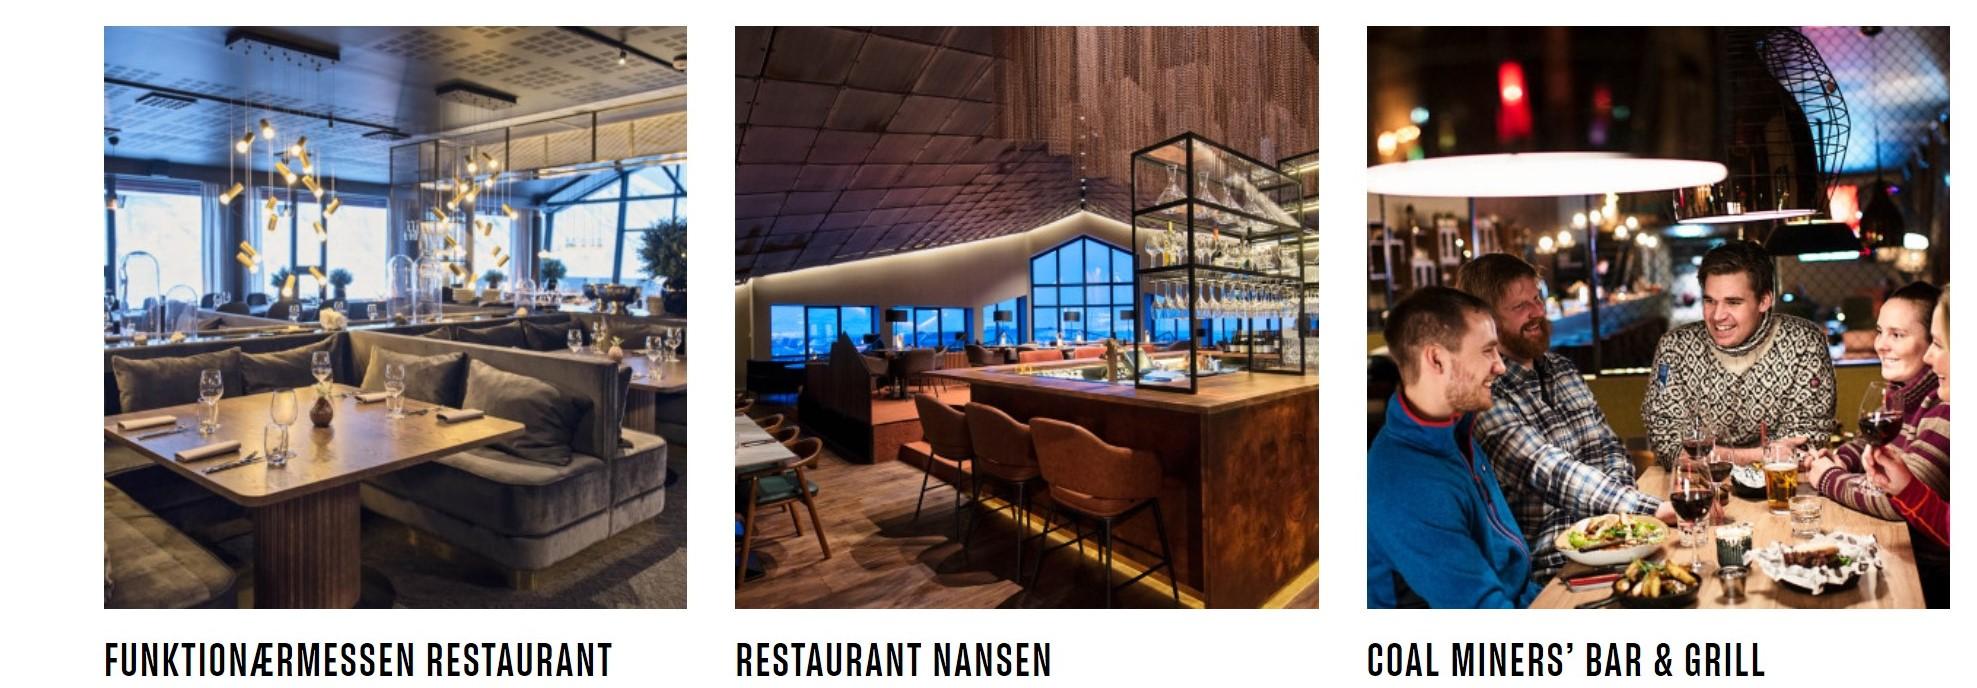 Hurtigruten restaurants.jpg